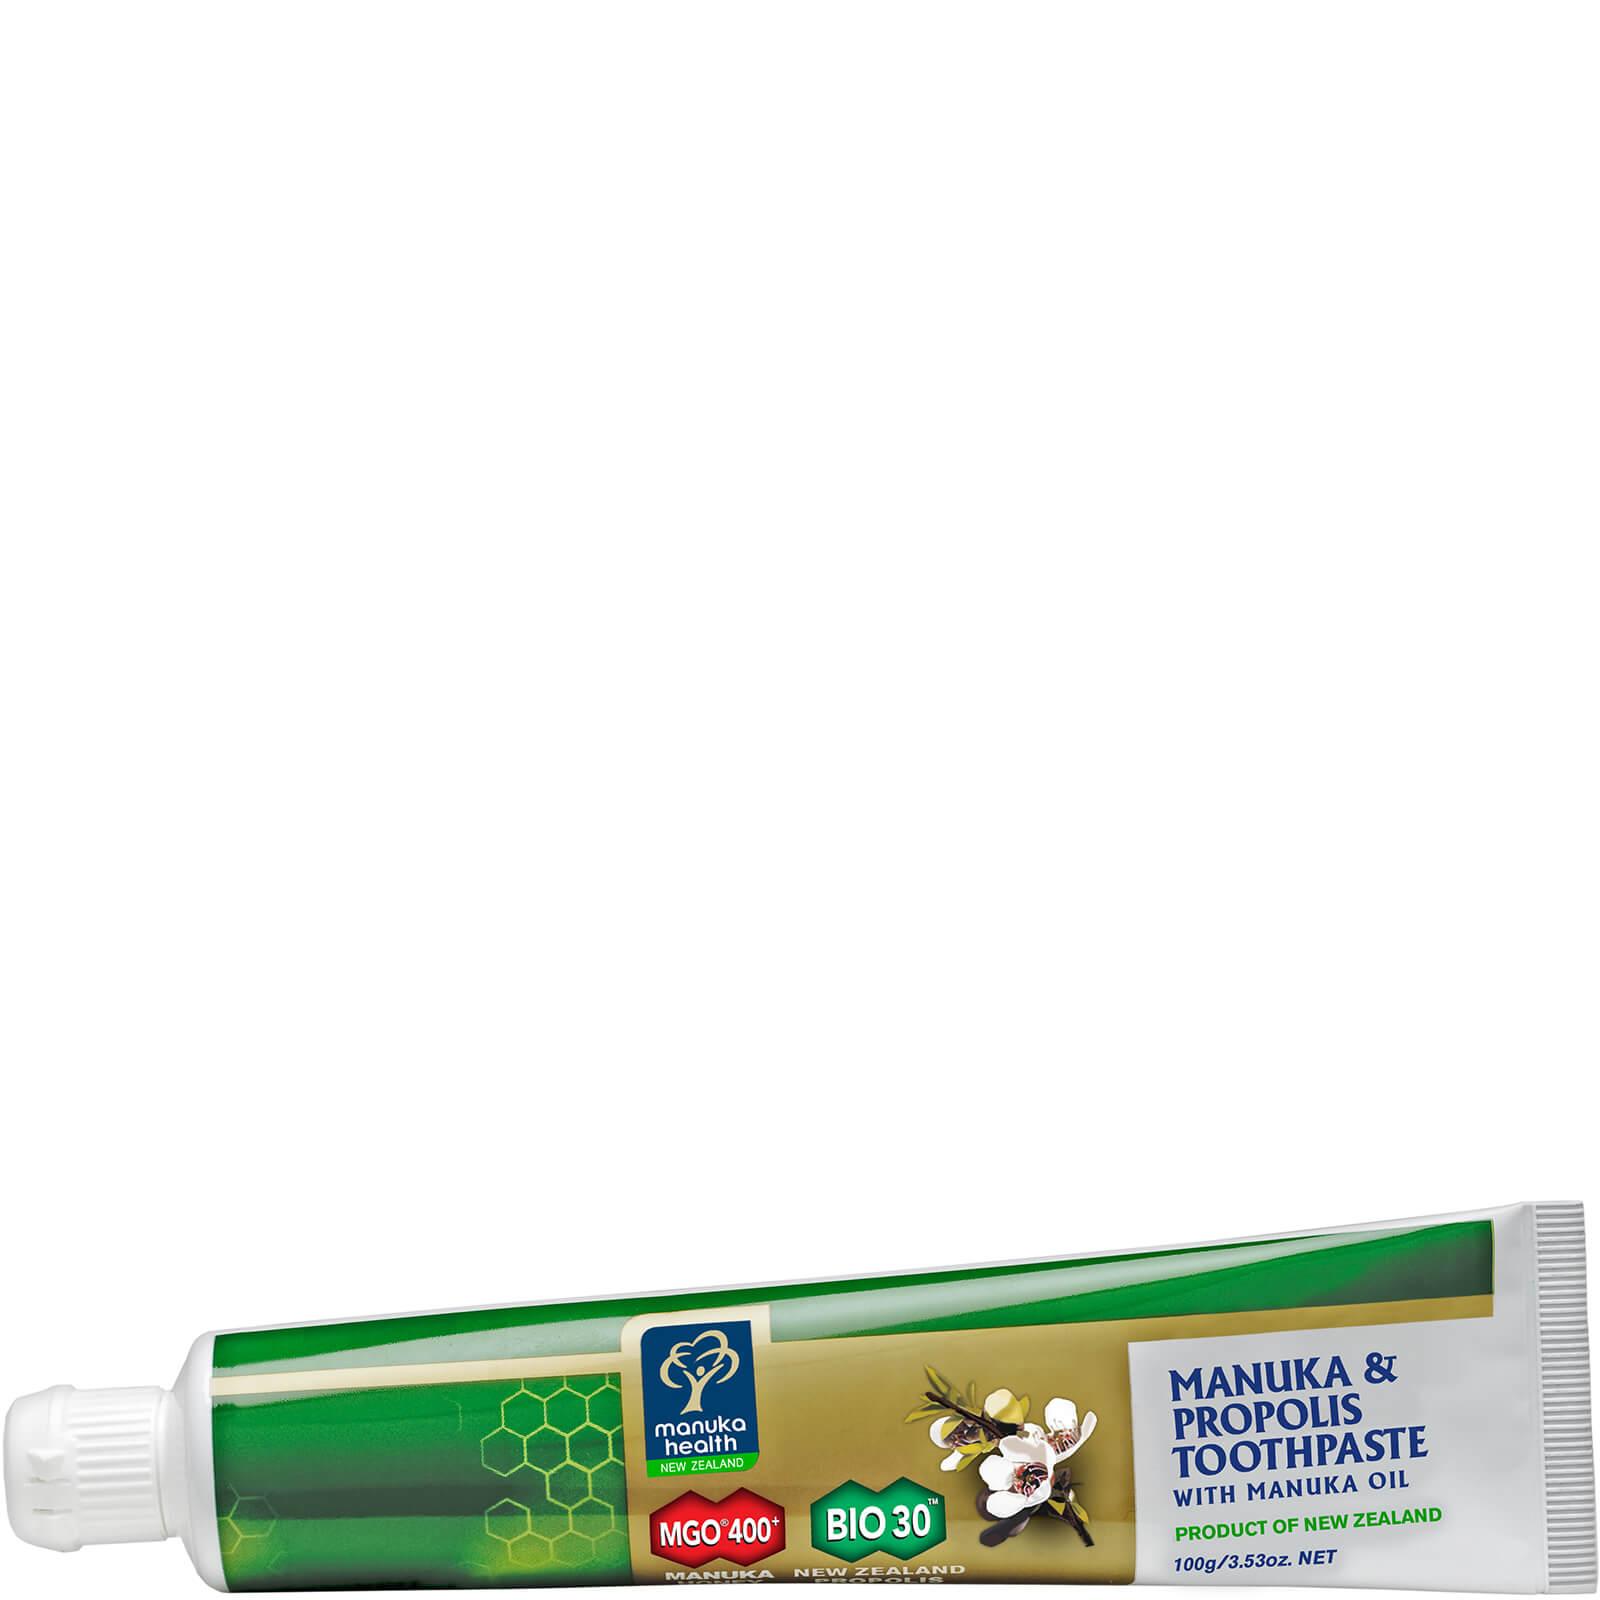 Manuka Health New Zealand Ltd Dentifrice à l'Huile de Manuka MGO 400+ et Propolis Manuka Health 100 g